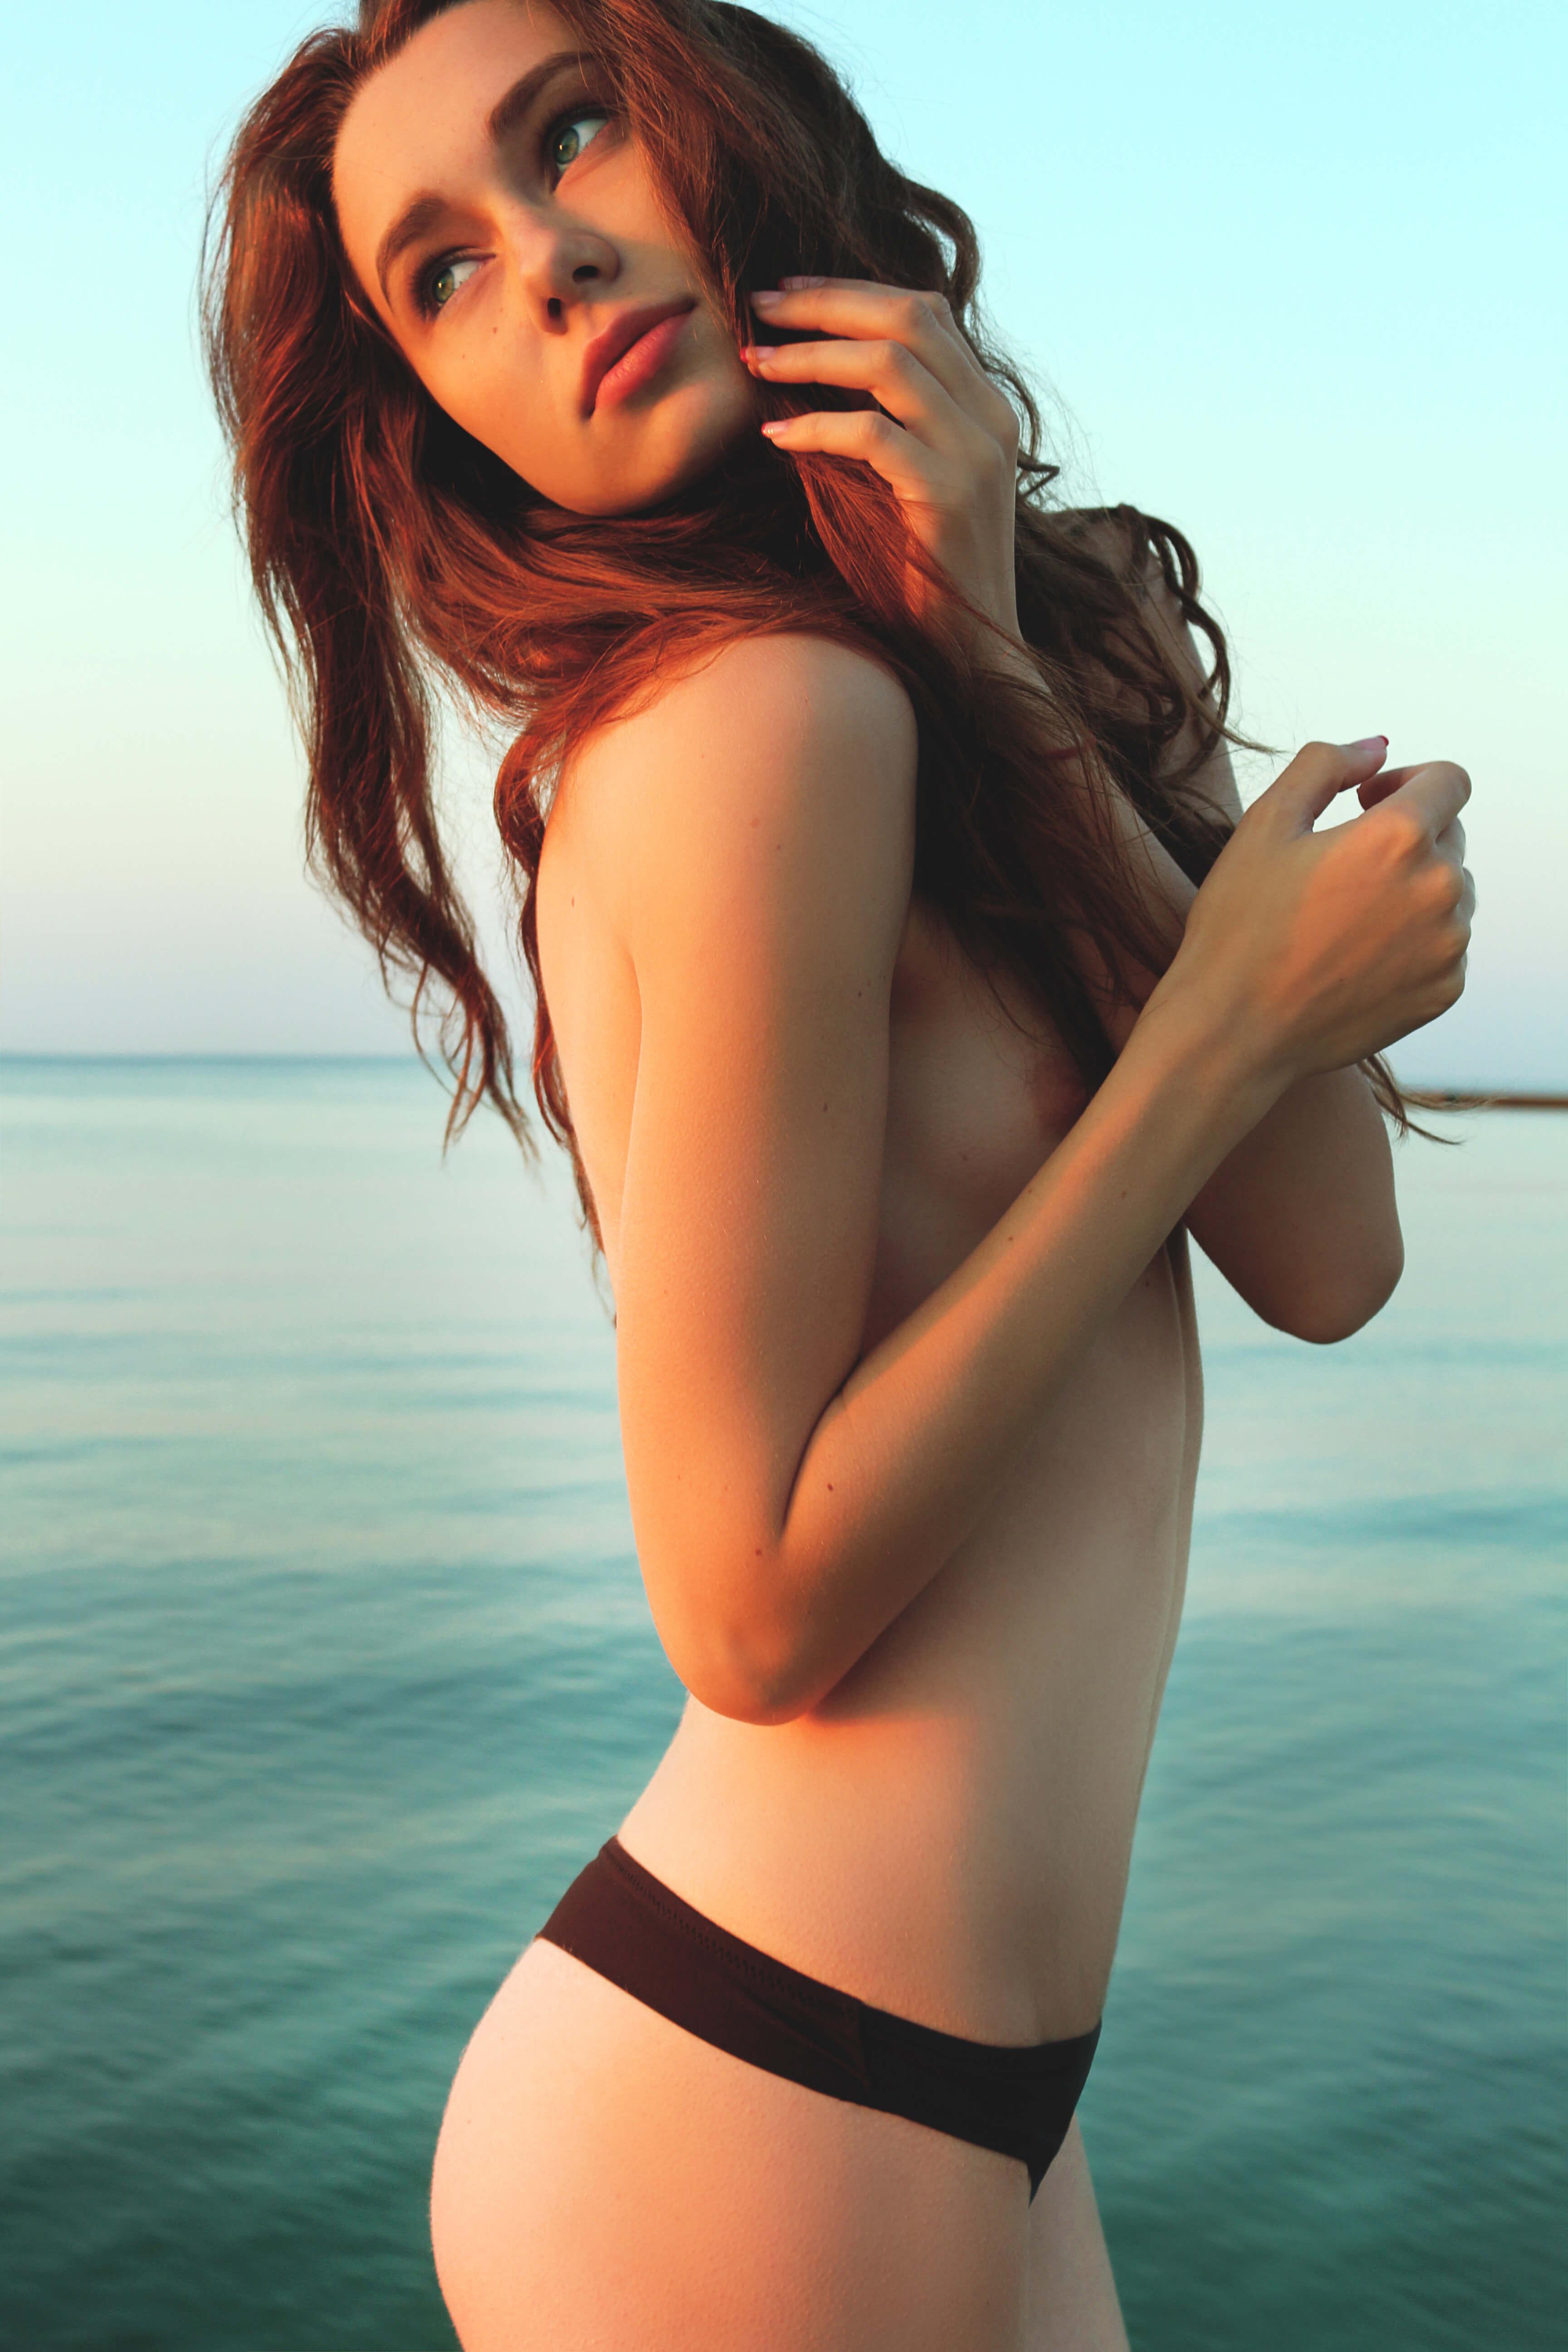 Fashion Photography Brisbane evelina photography evelina fietisova brisbane photogpher melbourne photographer implied nude boudoir photography brisbane beach